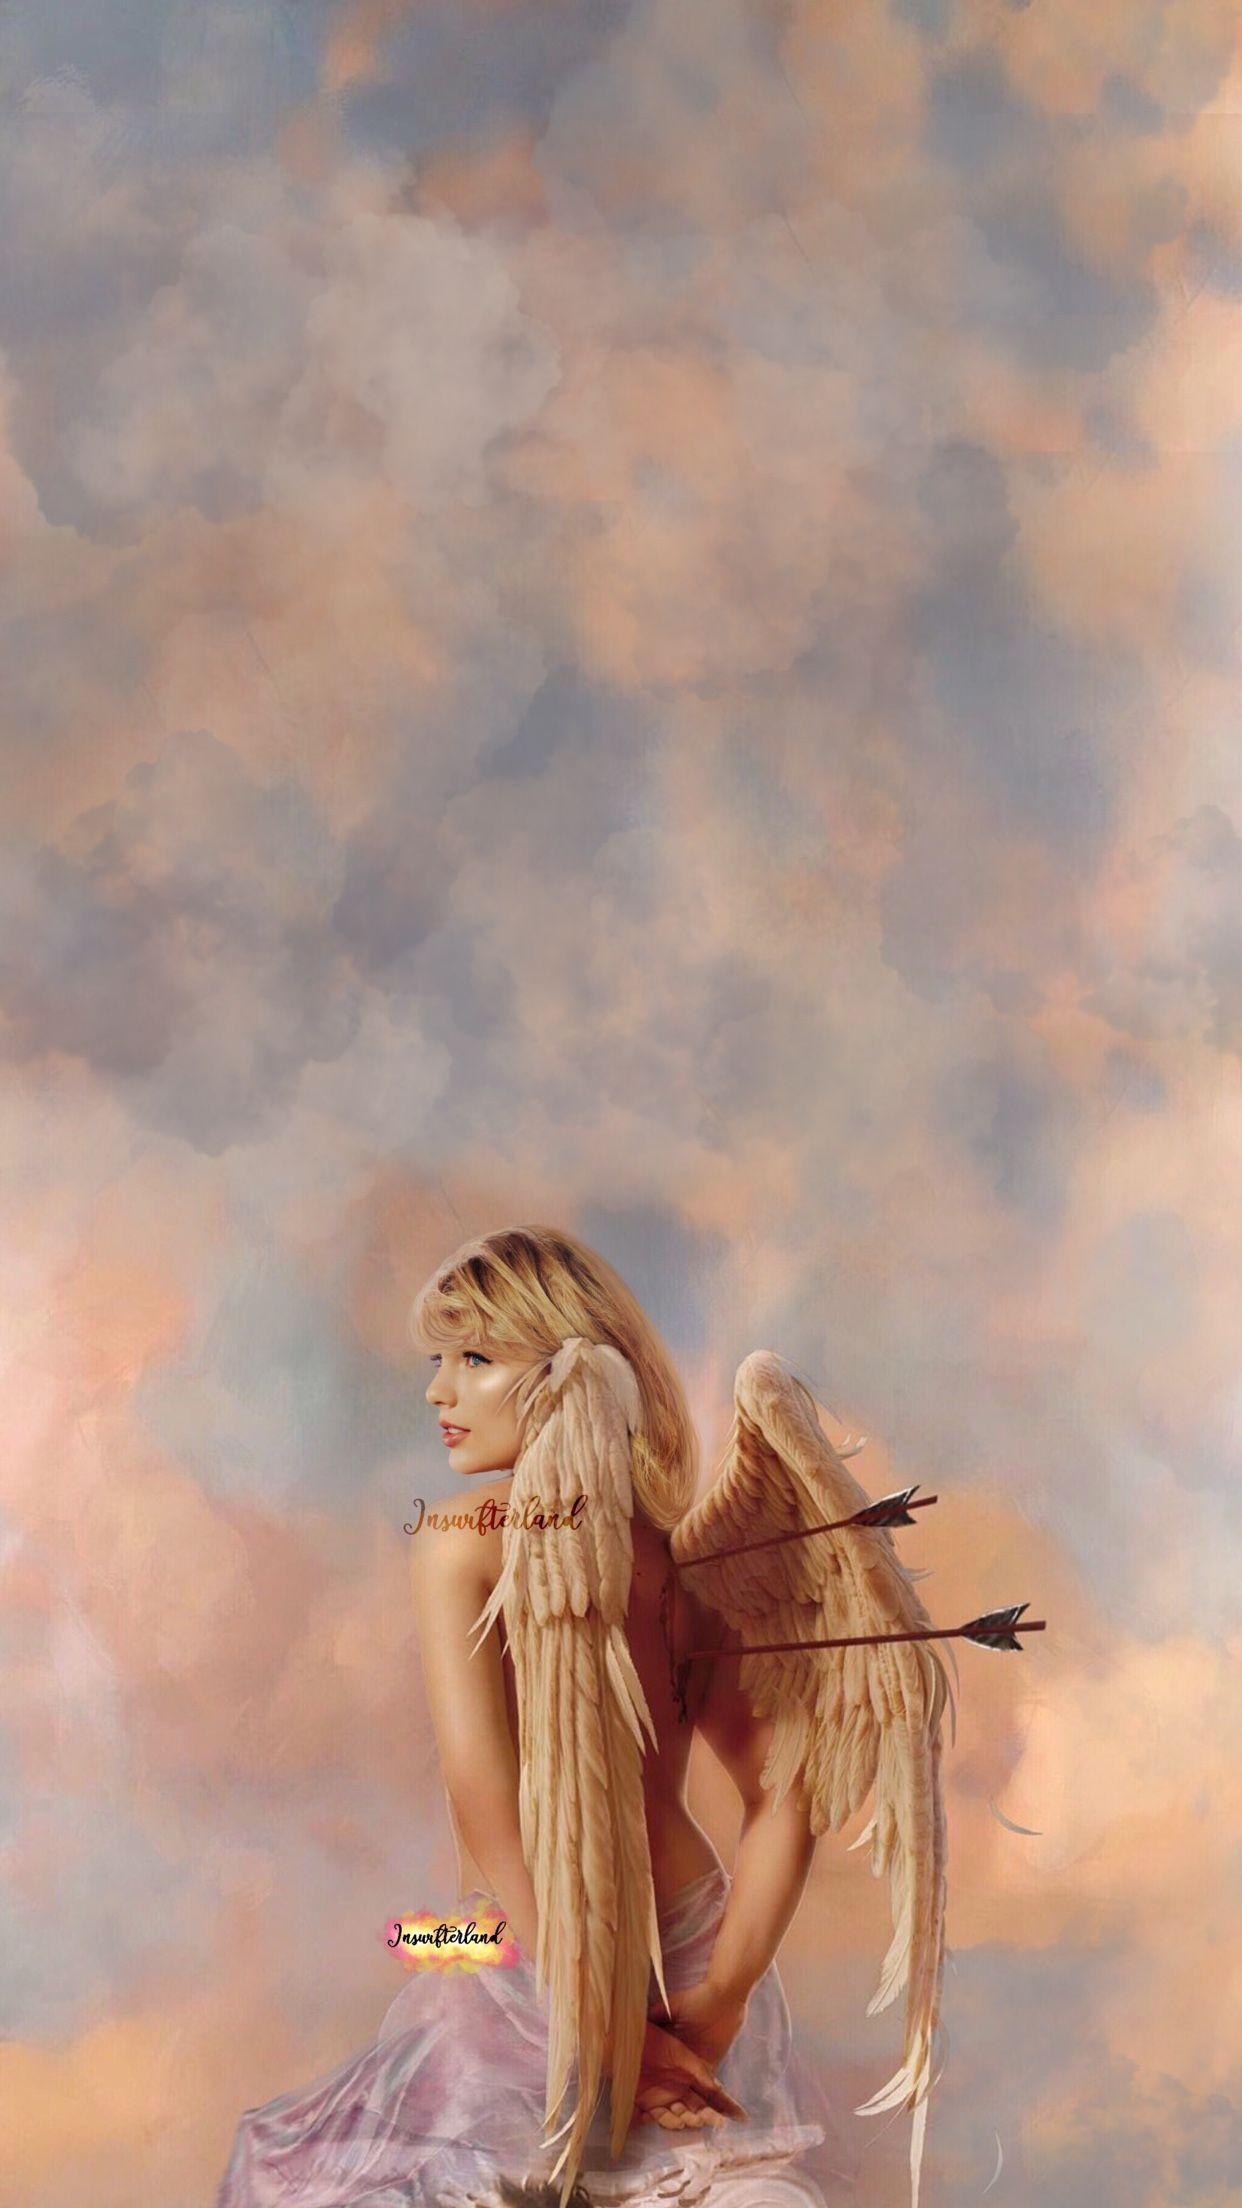 Taylor Swift Wallpaper Taylor Swift Wallpaper Taylor Swift 22 Taylor Swift Pictures